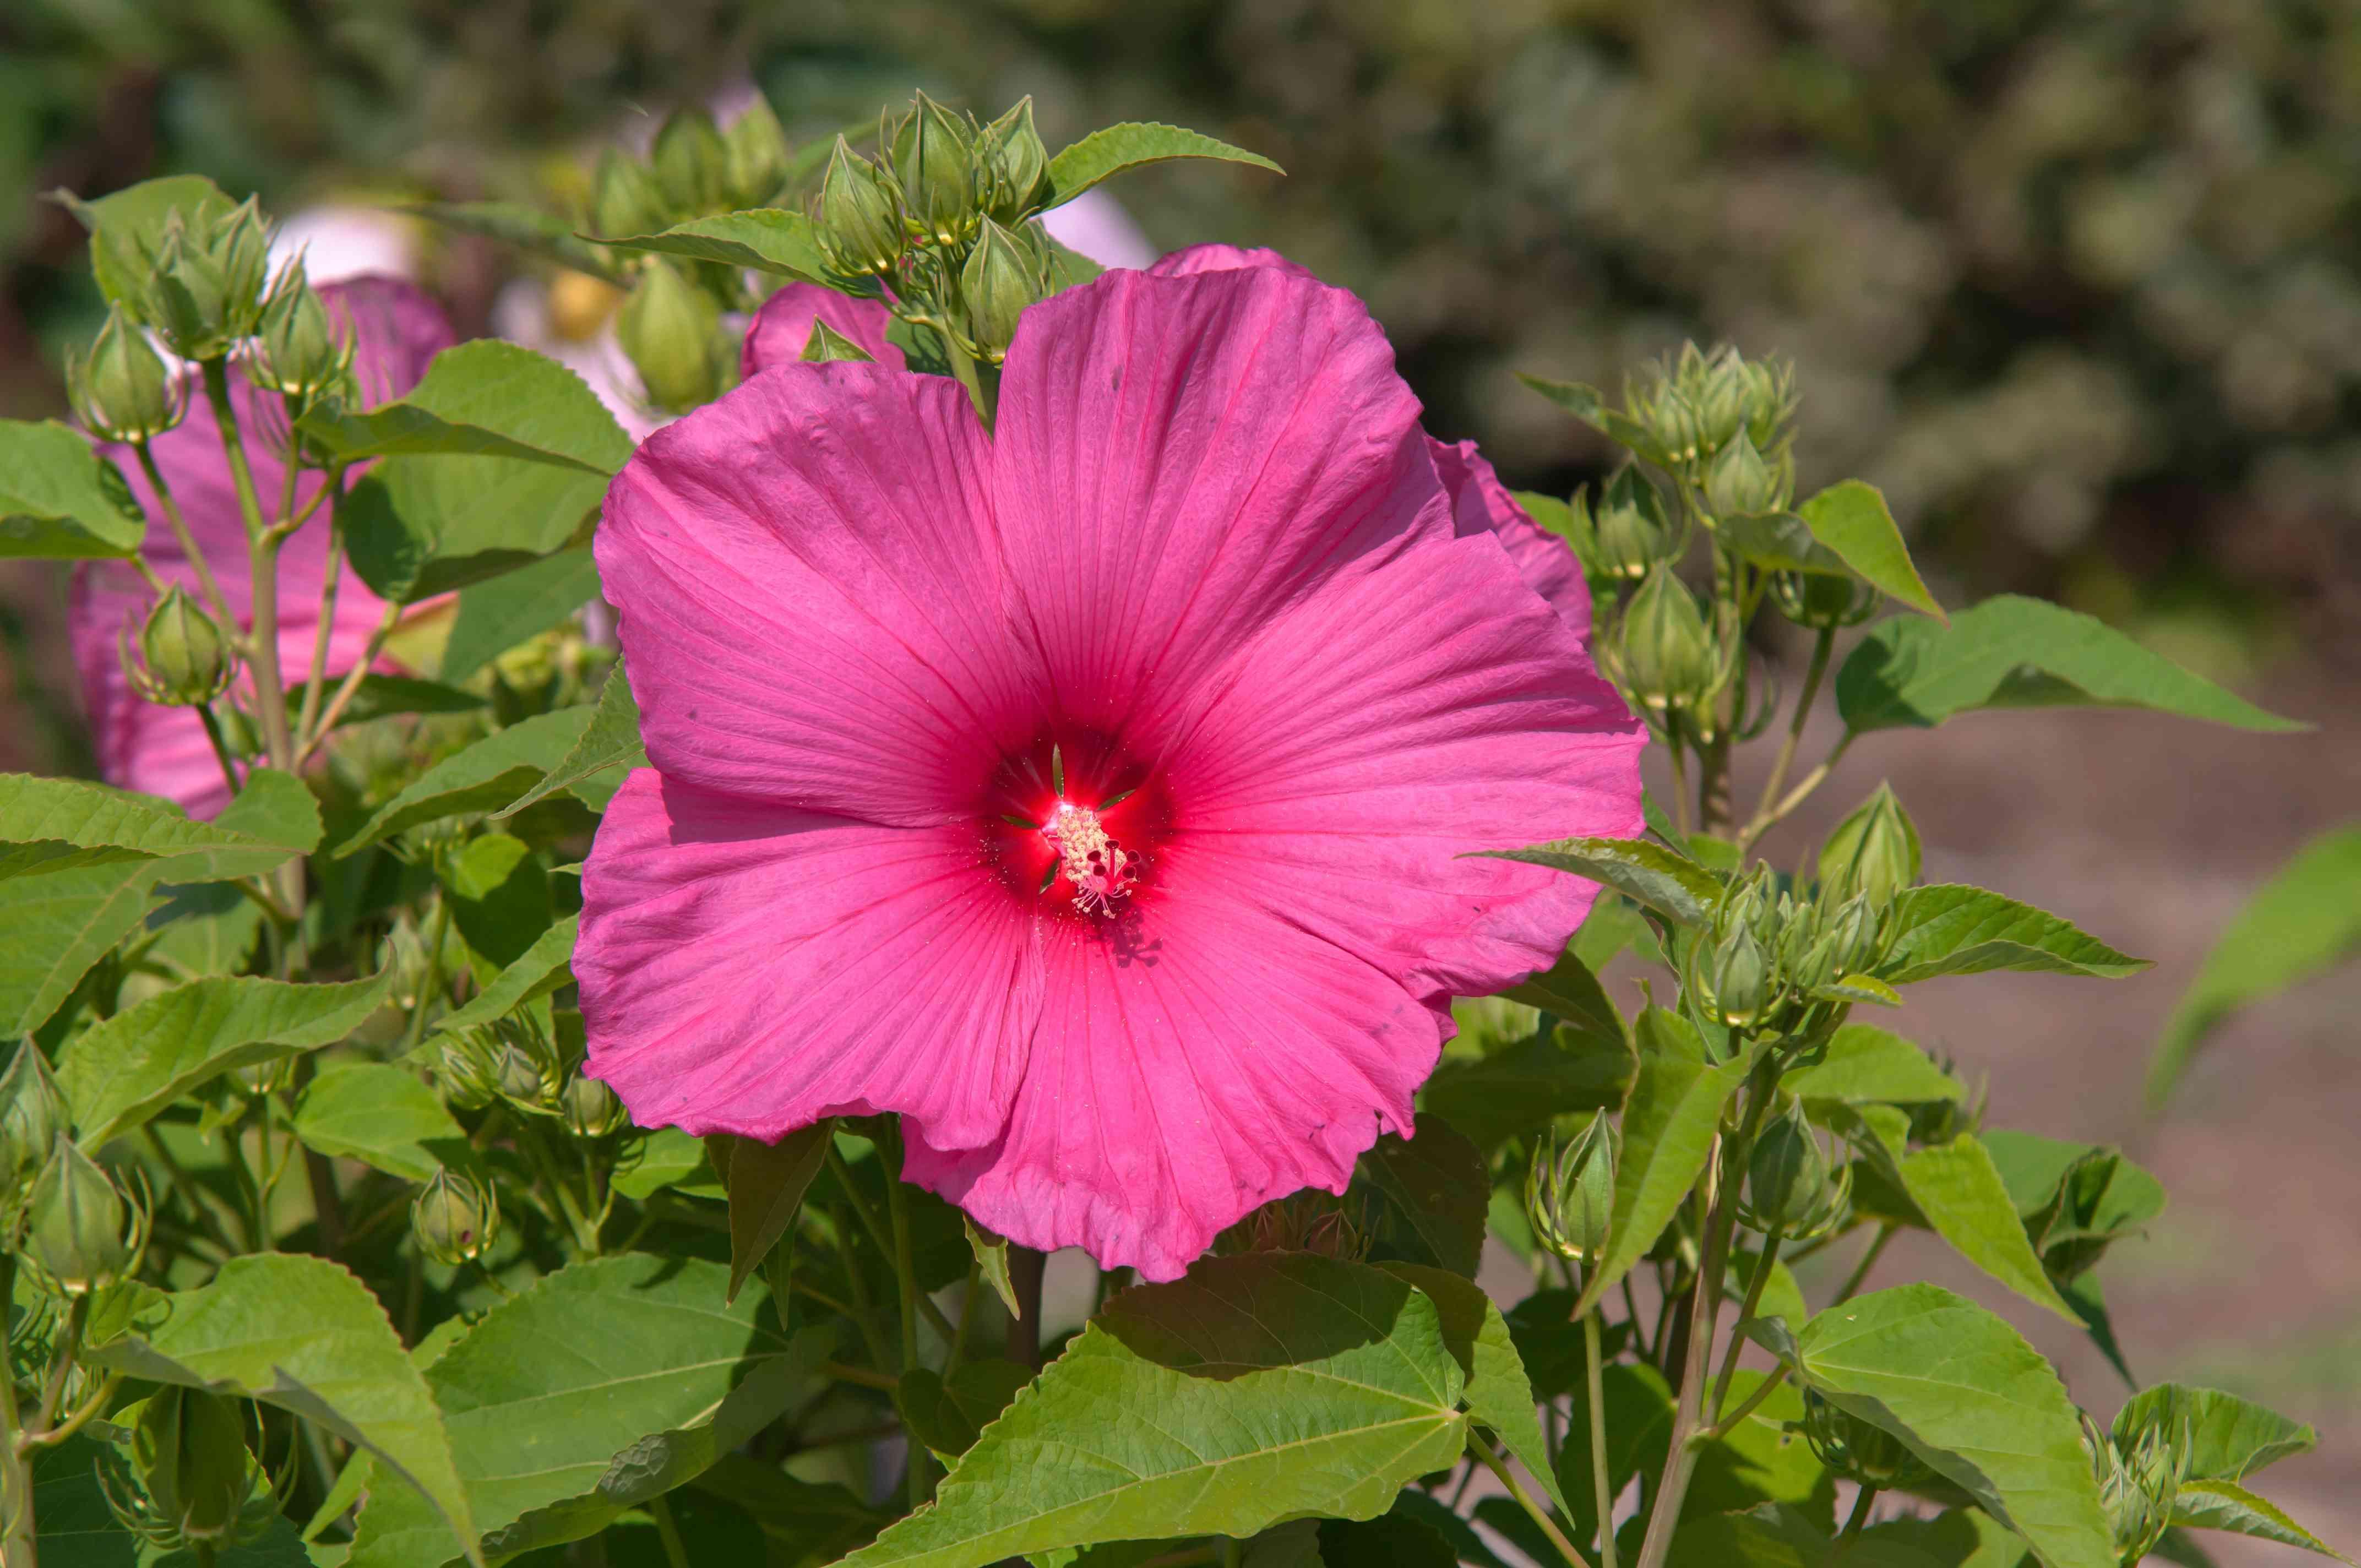 Hibiscus moscheutos plant with pink petals in sunlight